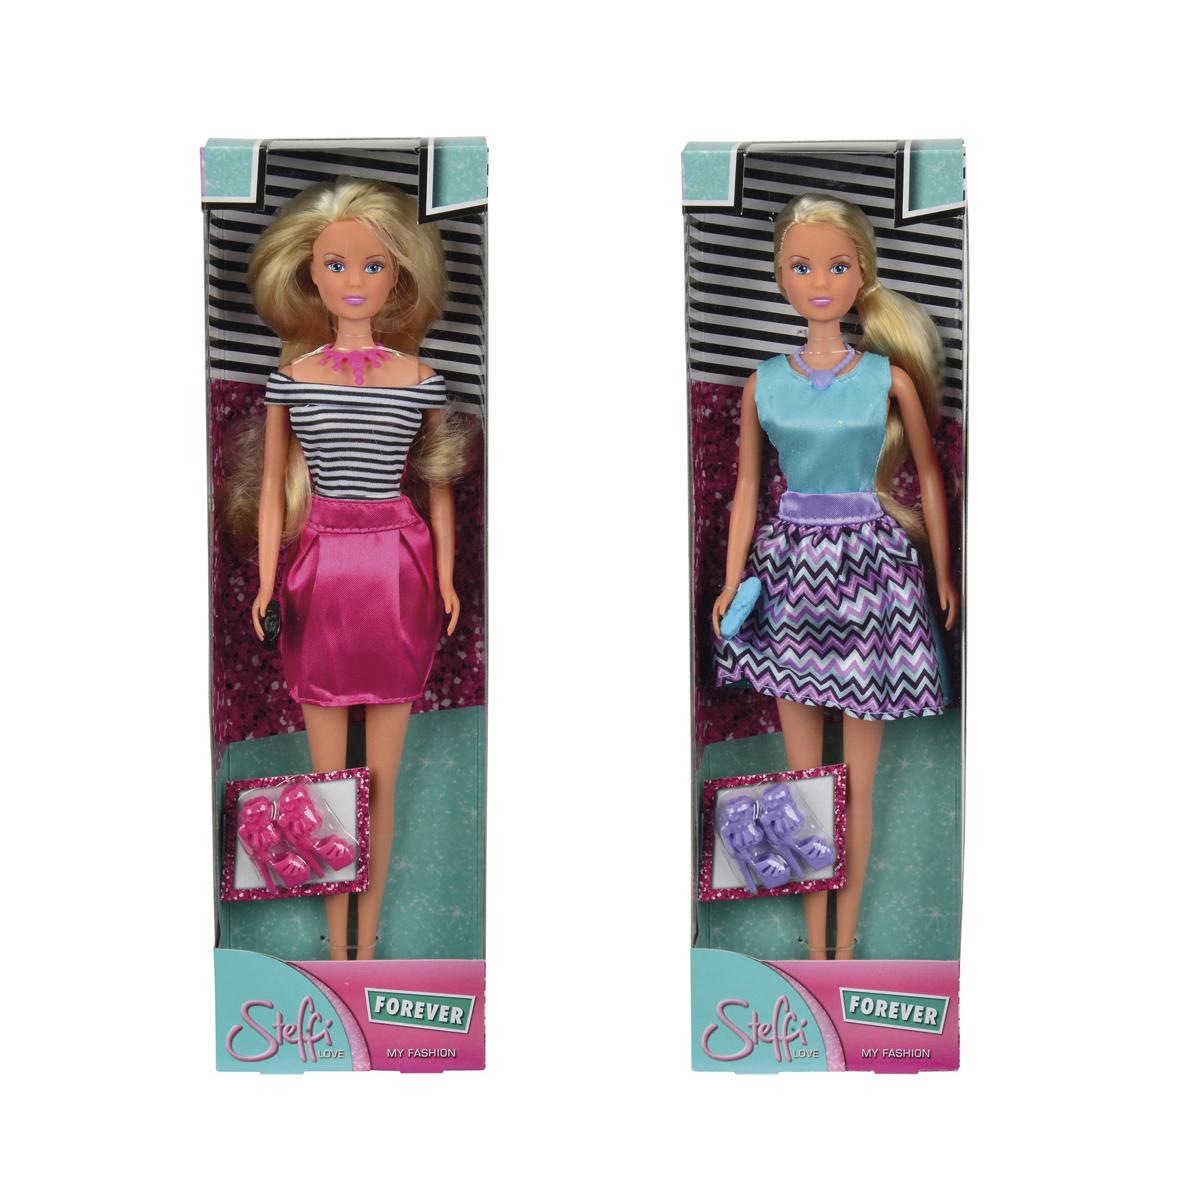 Кукла Steffi Forever, 2 видаКуклы Steffi (Штеффи)<br>Кукла Steffi Forever, 2 вида<br>